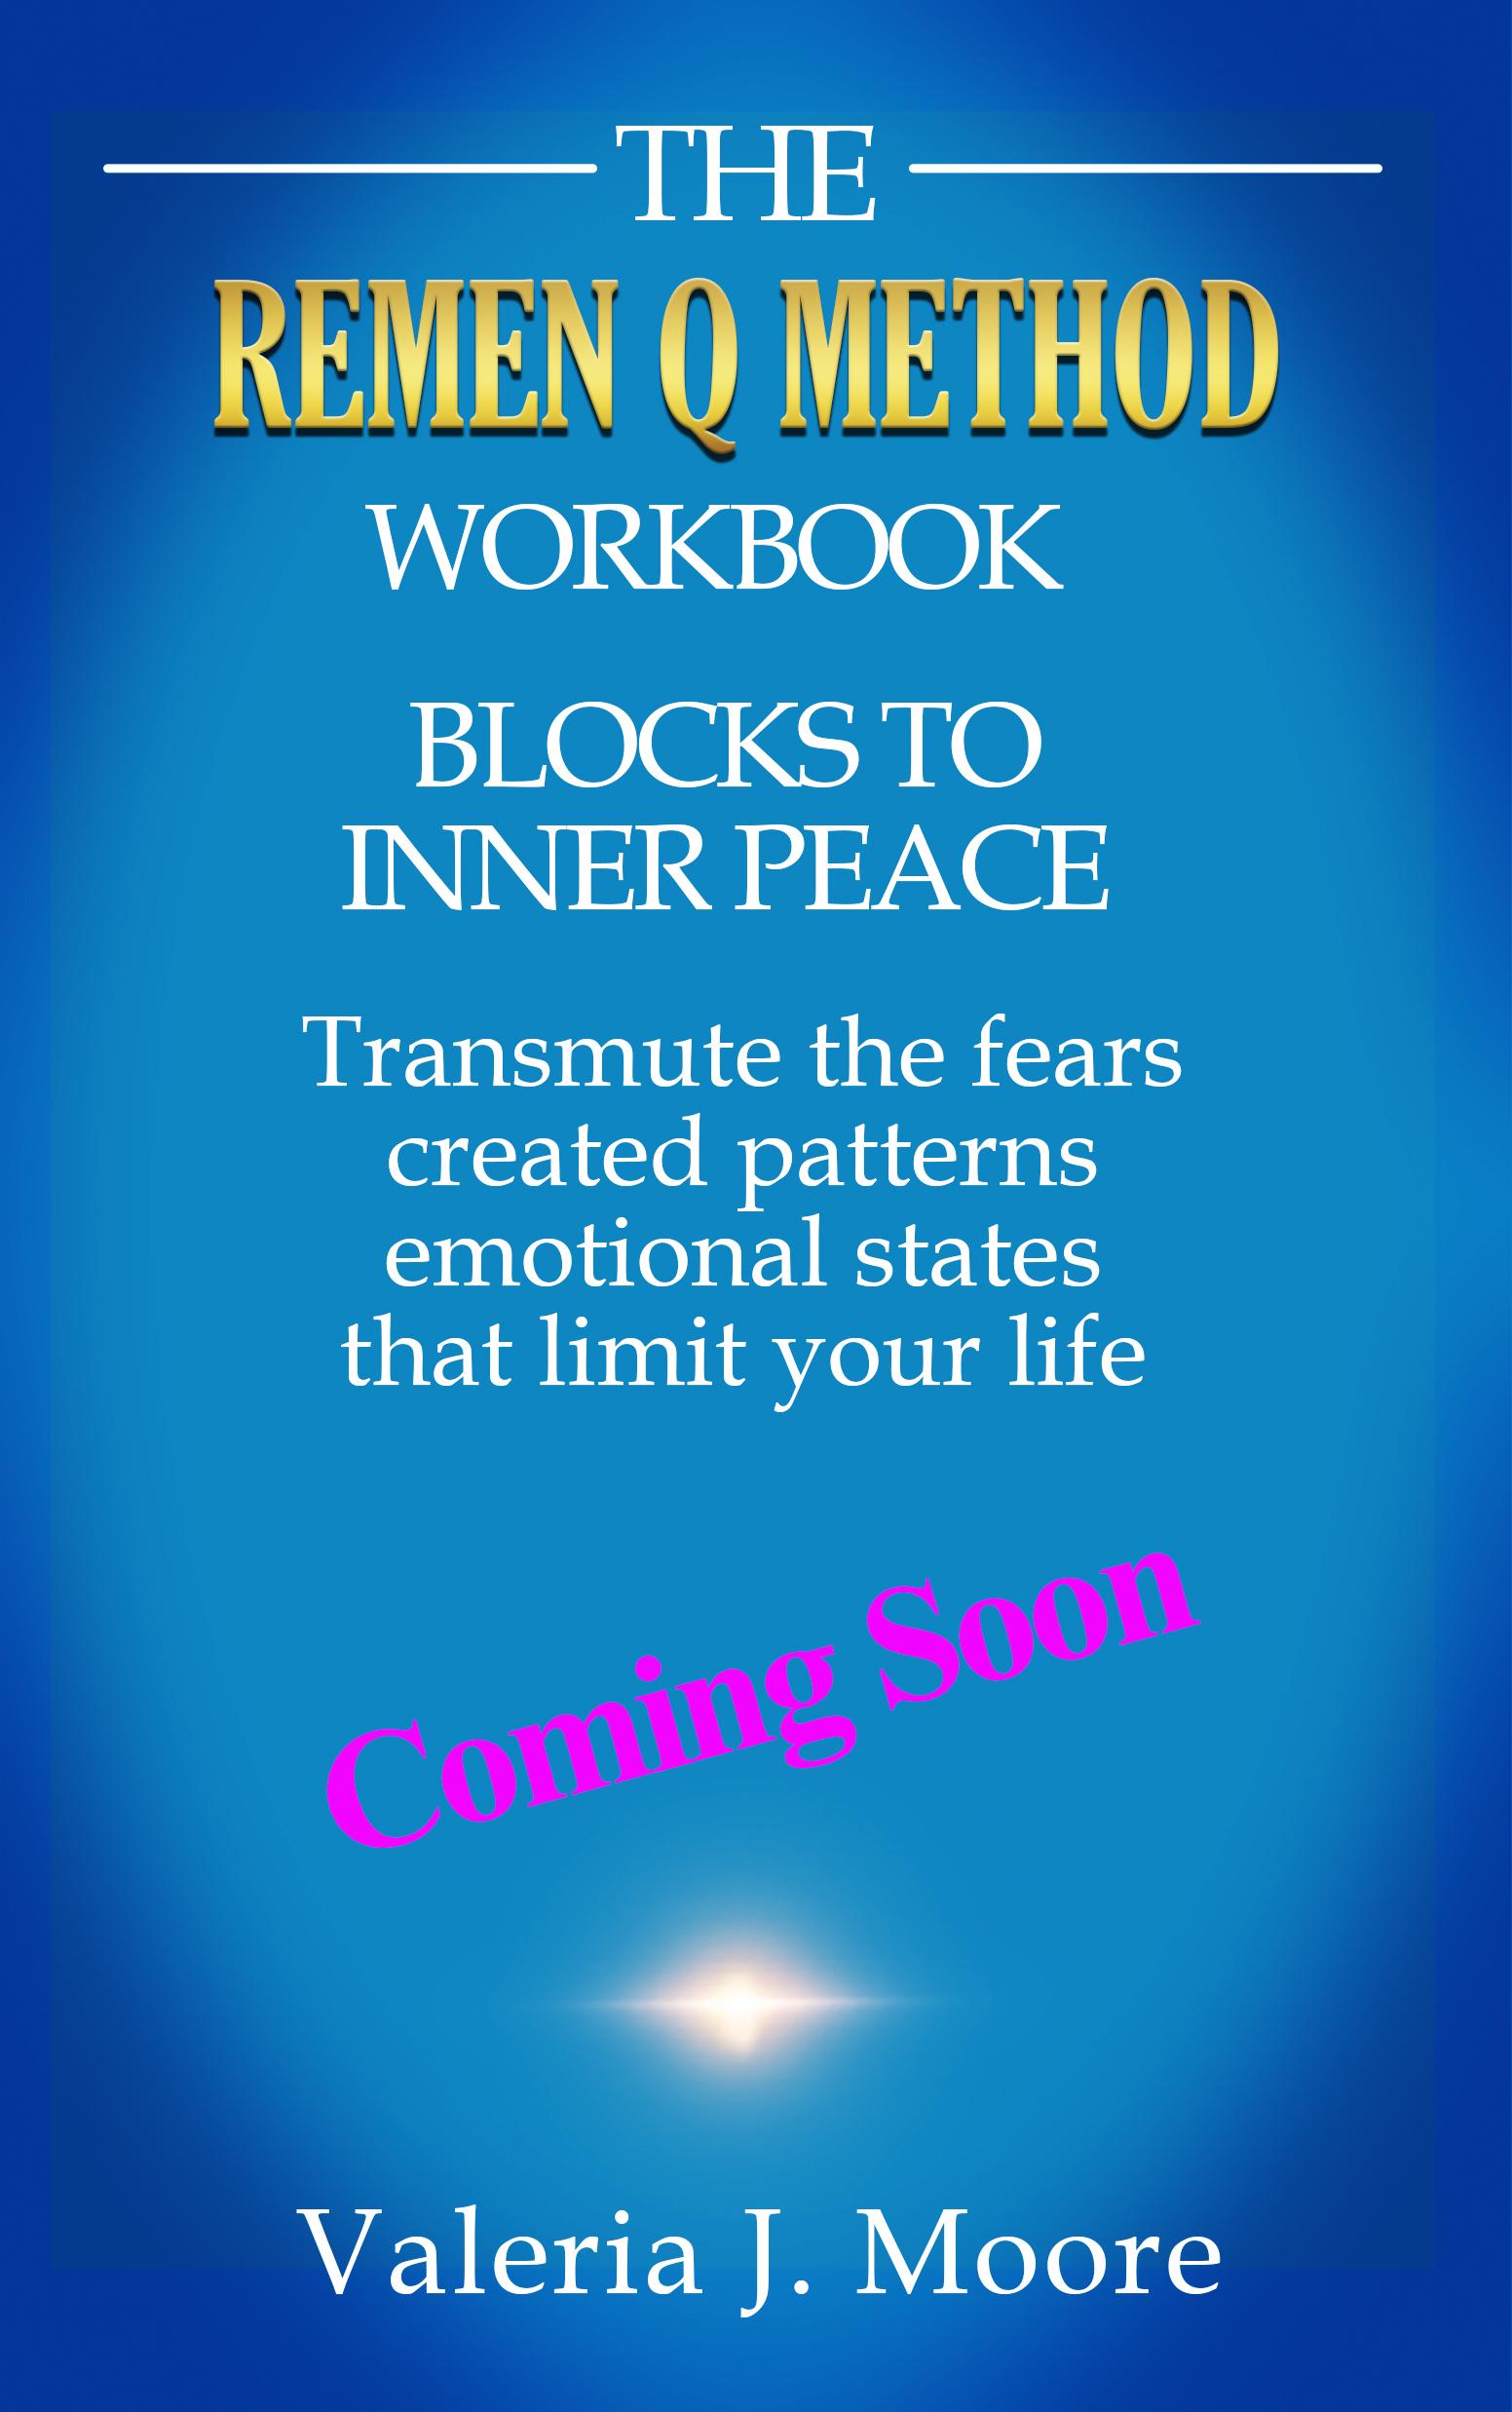 Remen Q book workbook template blocks to inner peace